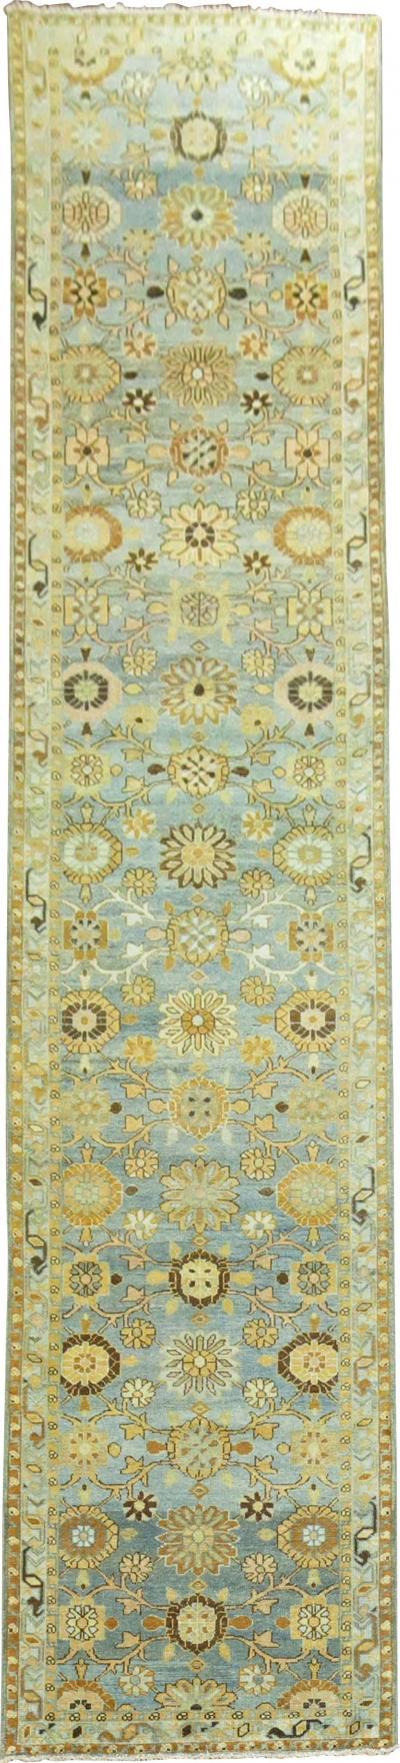 Aqua Blue Antique Tabriz Mini Khani Runner rug no j1787